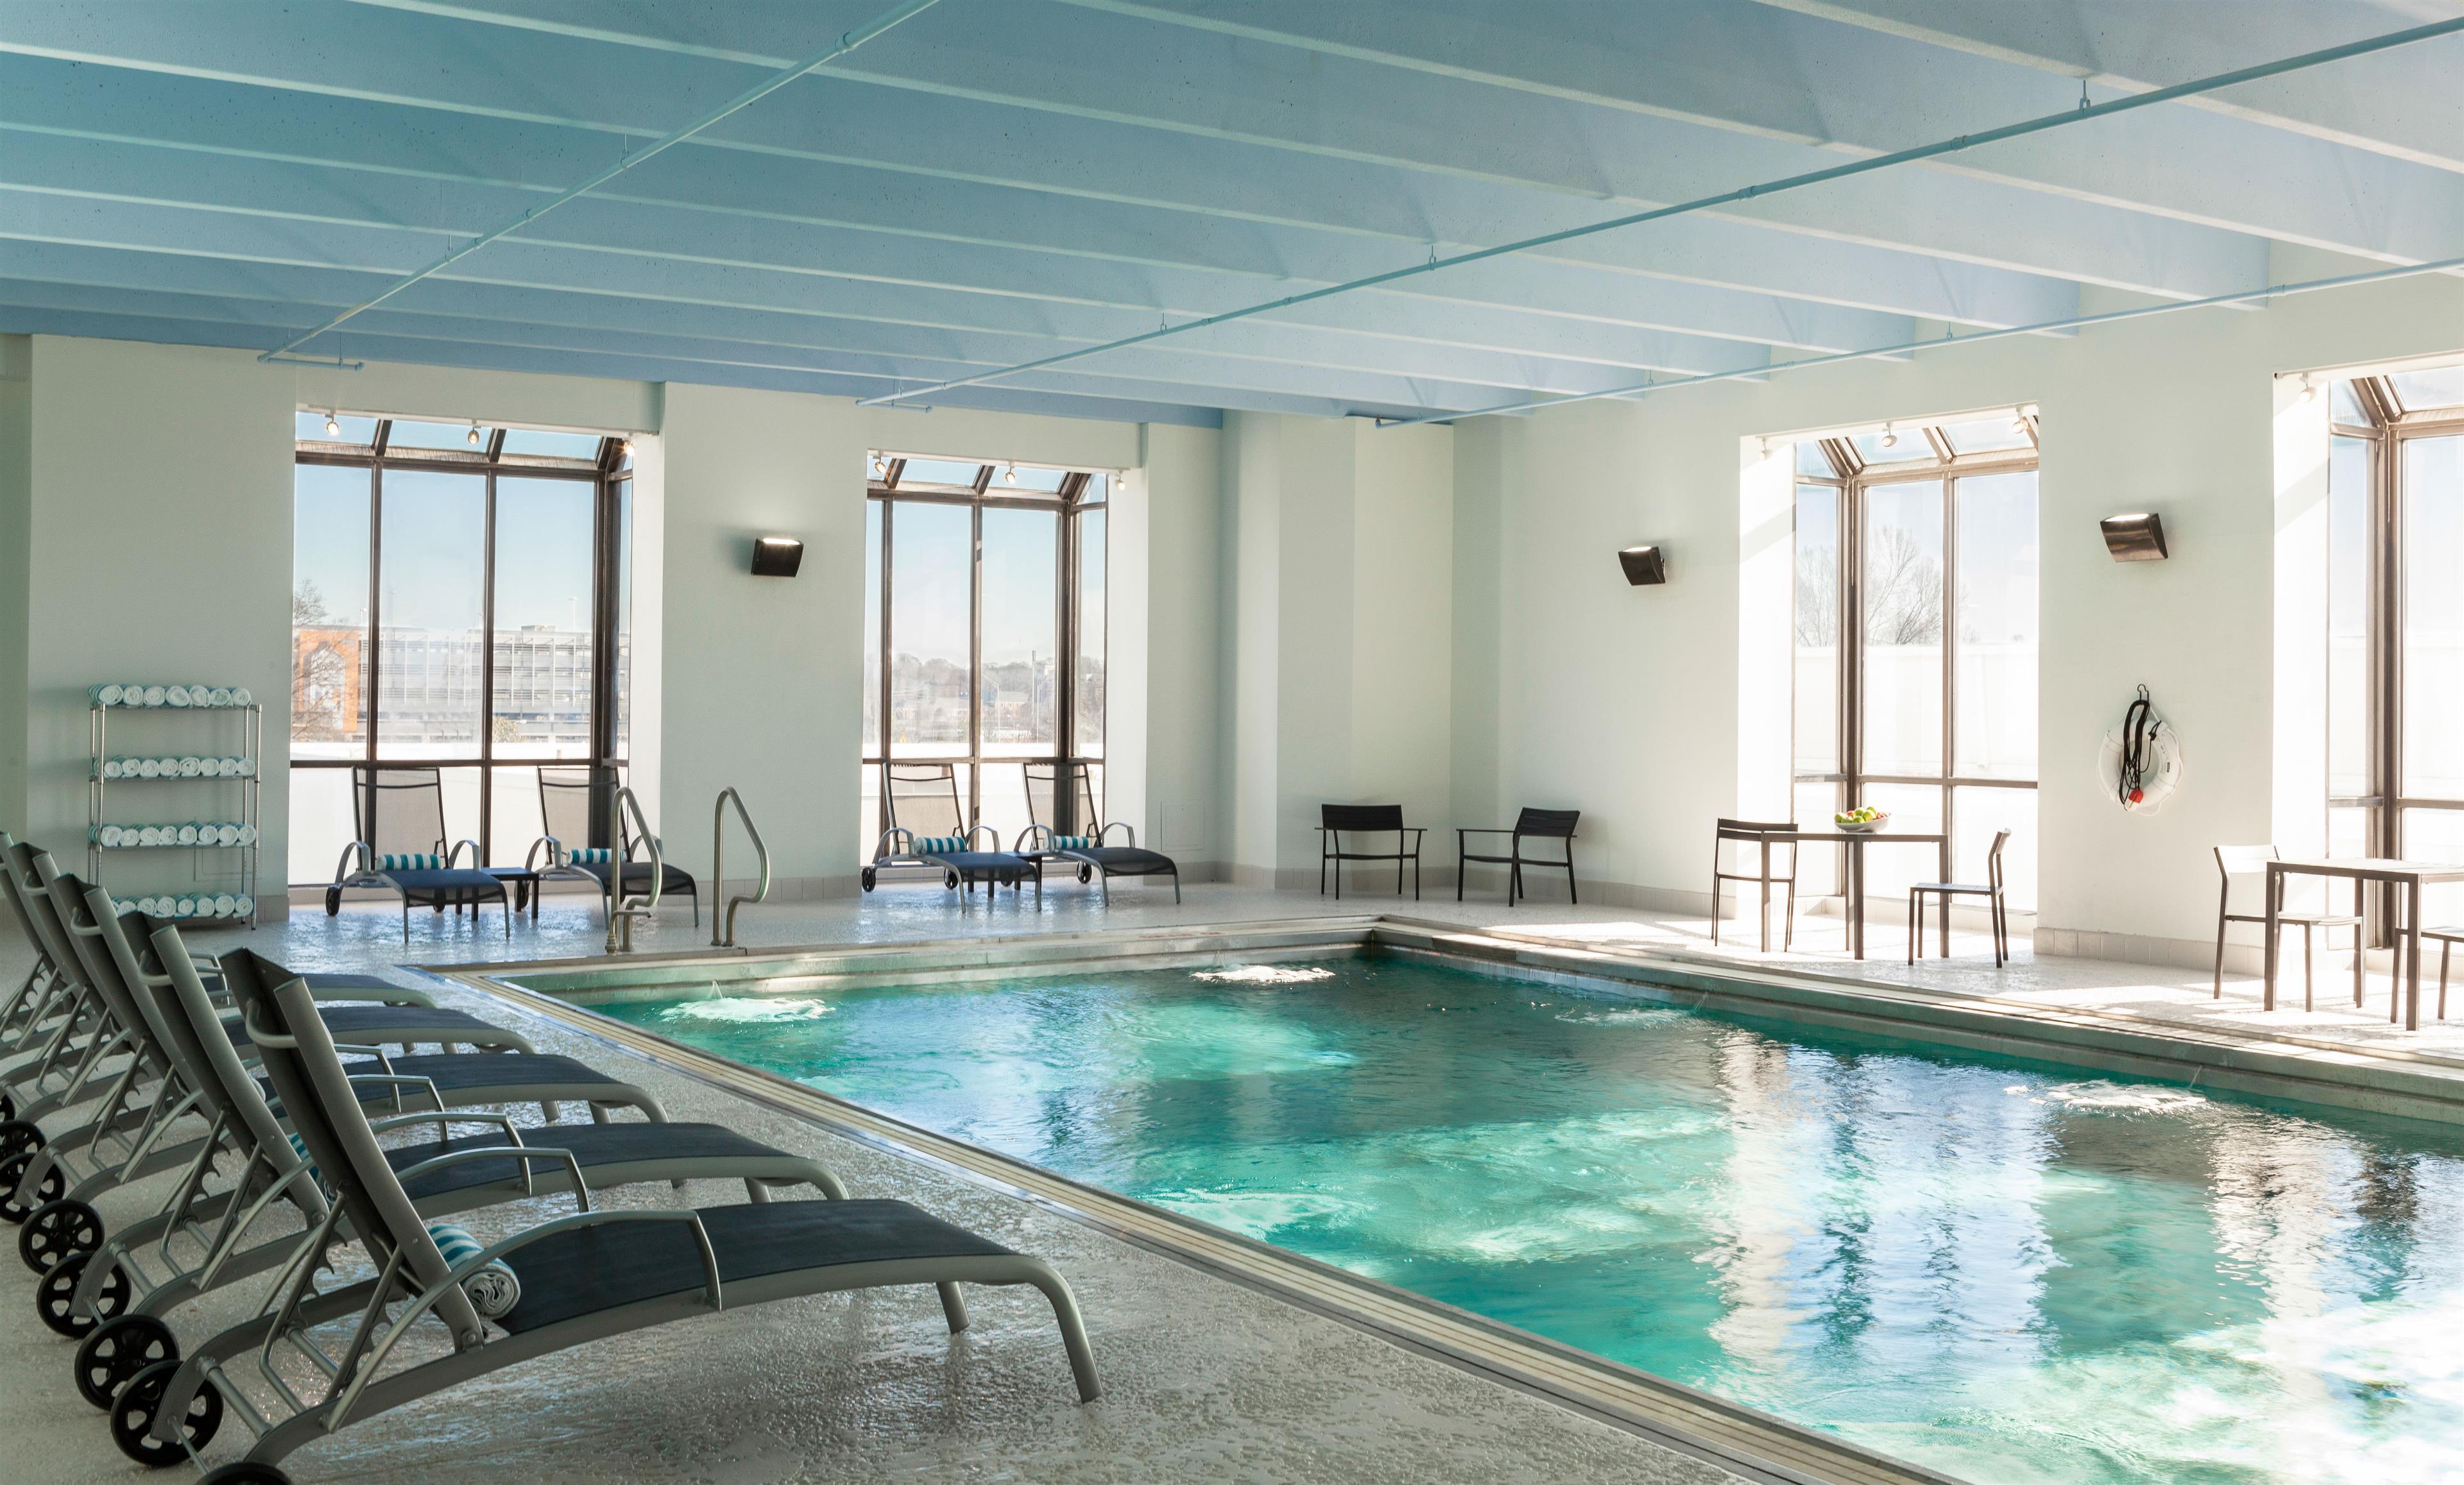 Sheraton charlotte hotel in charlotte nc 28204 - Indoor swimming pools charlotte nc ...